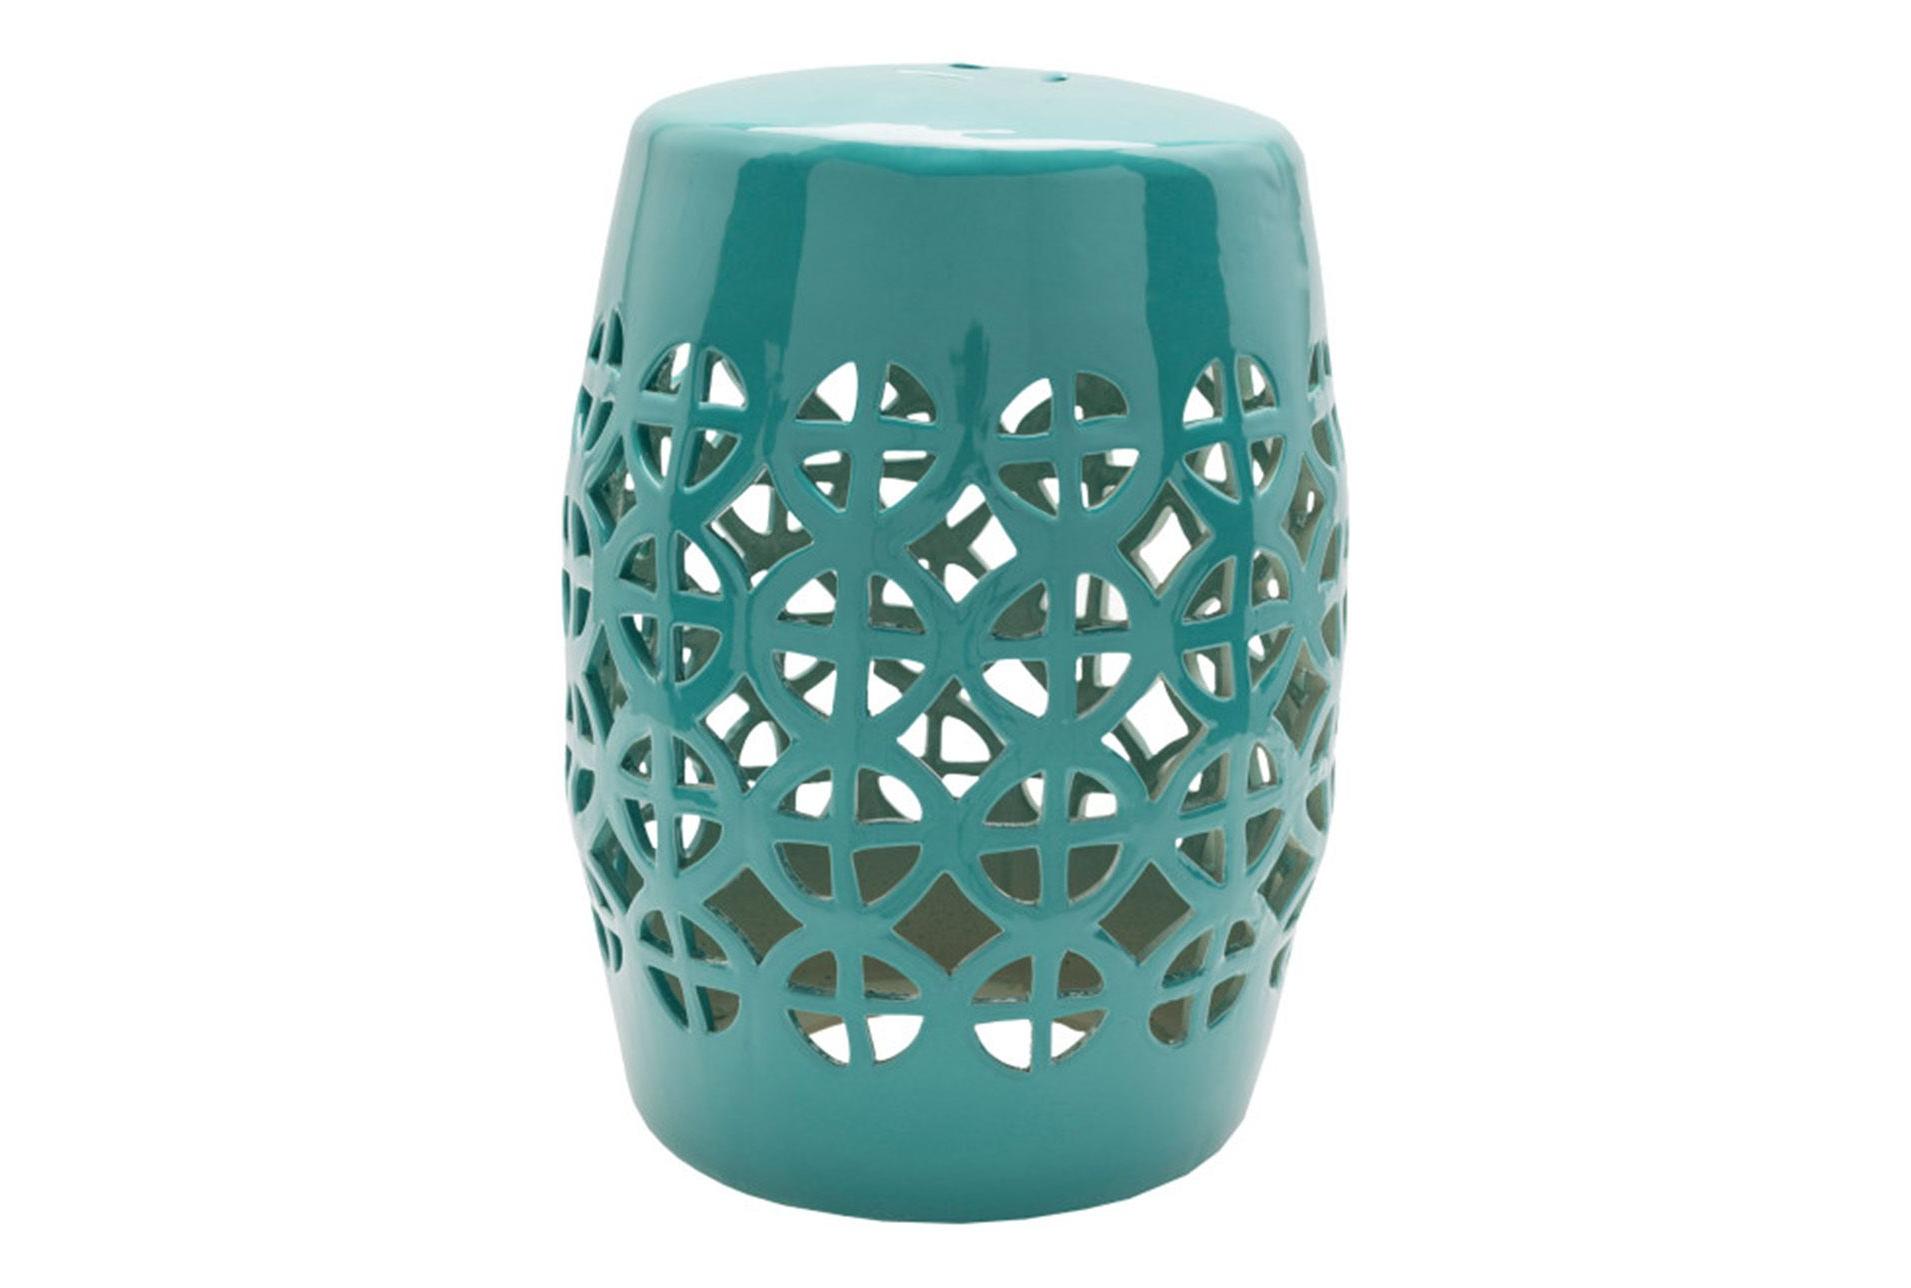 Widely Used Carmon Ceramic Garden Tool Intended For Carmon Ceramic Garden Tool – Vozeli (View 5 of 30)